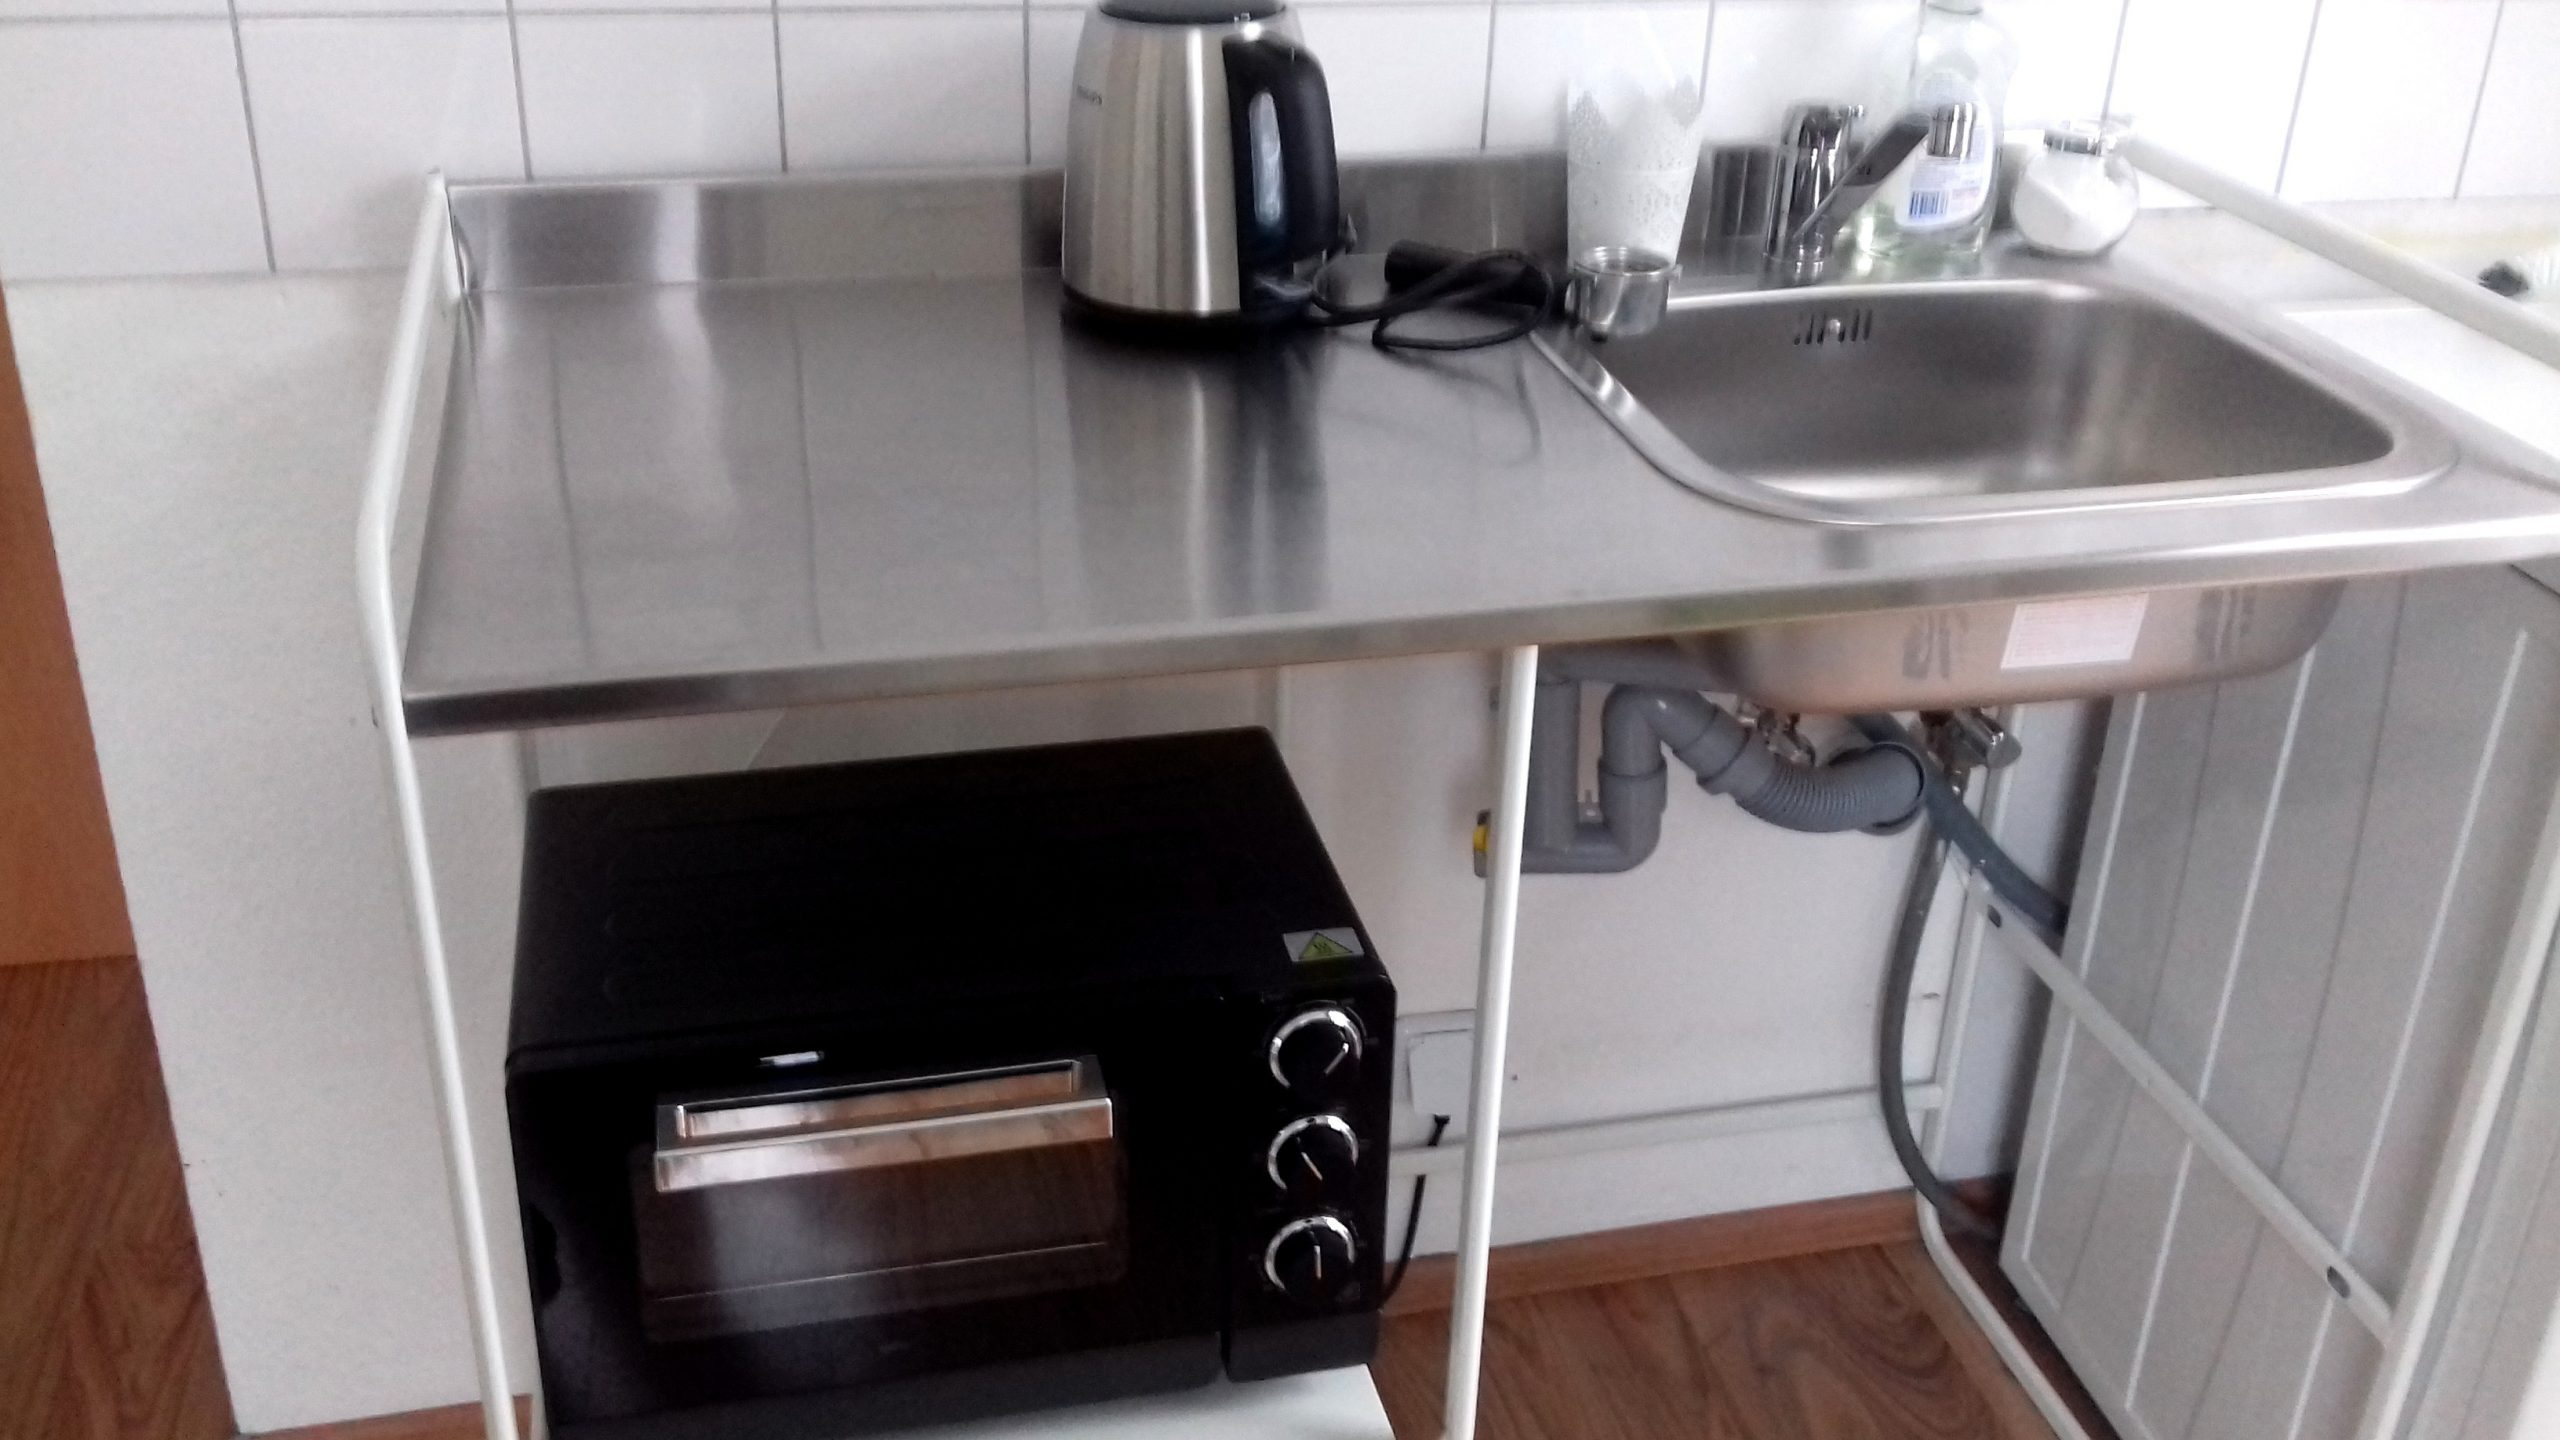 Full Size of Mobile Küche Anhänger Kaufen Vanessa Mobile Küche Mobile Küche Altenheim Mobile Küche Willhaben Küche Mobile Küche